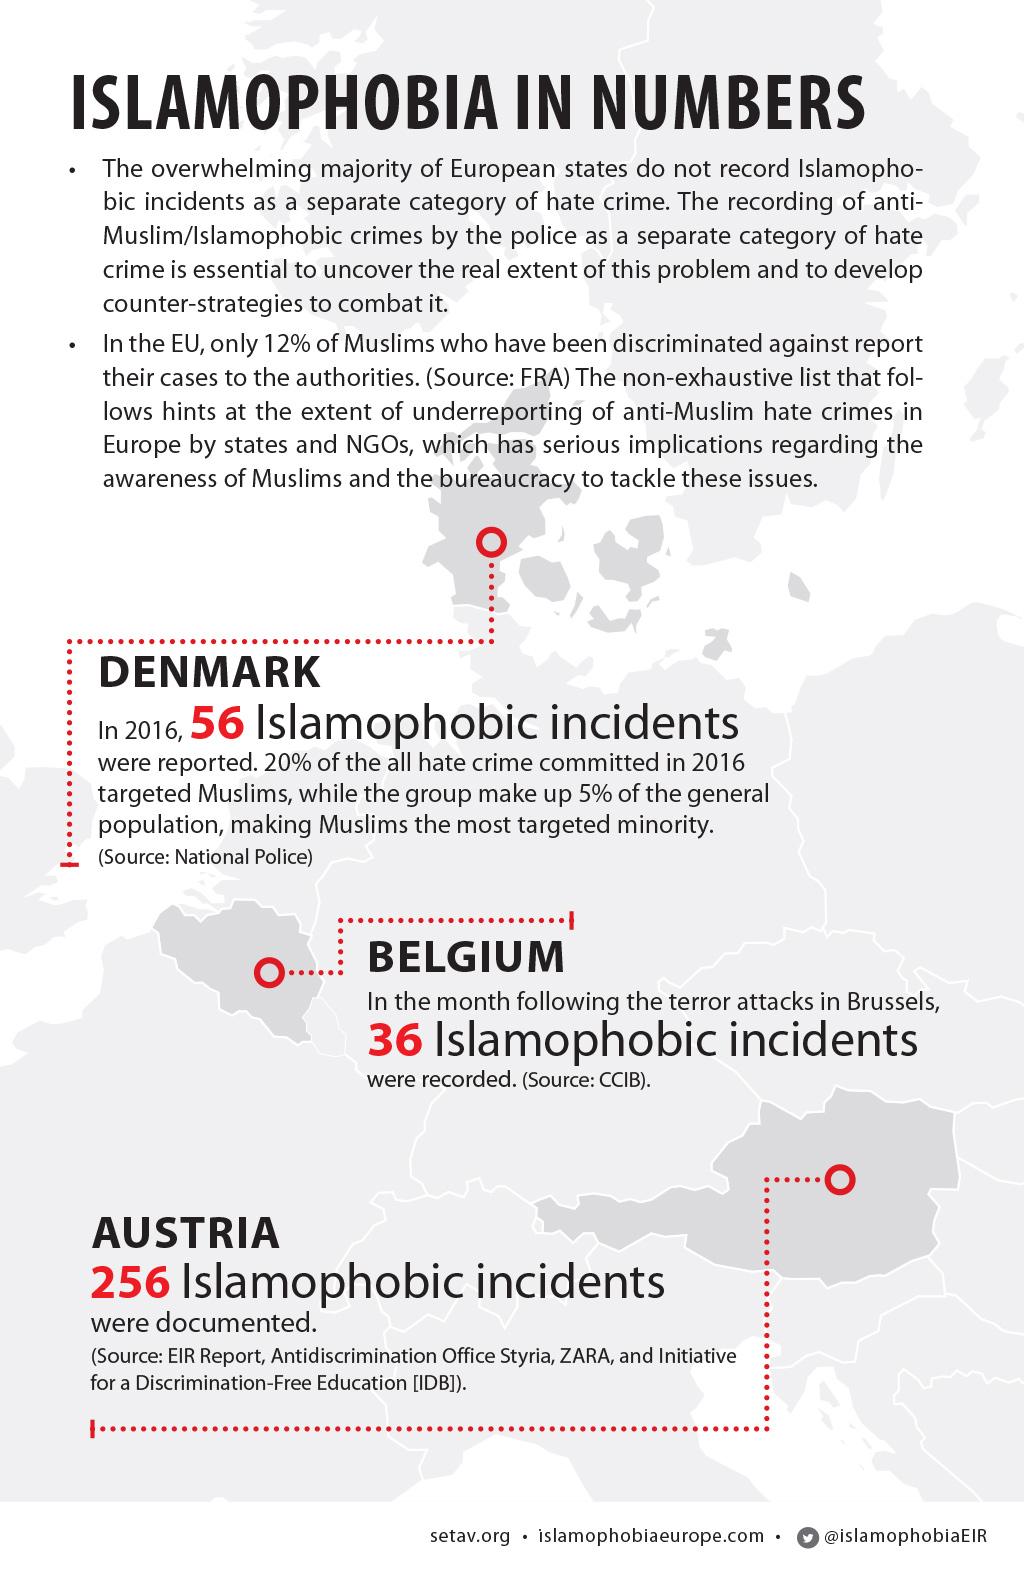 Islamophobia in numbers